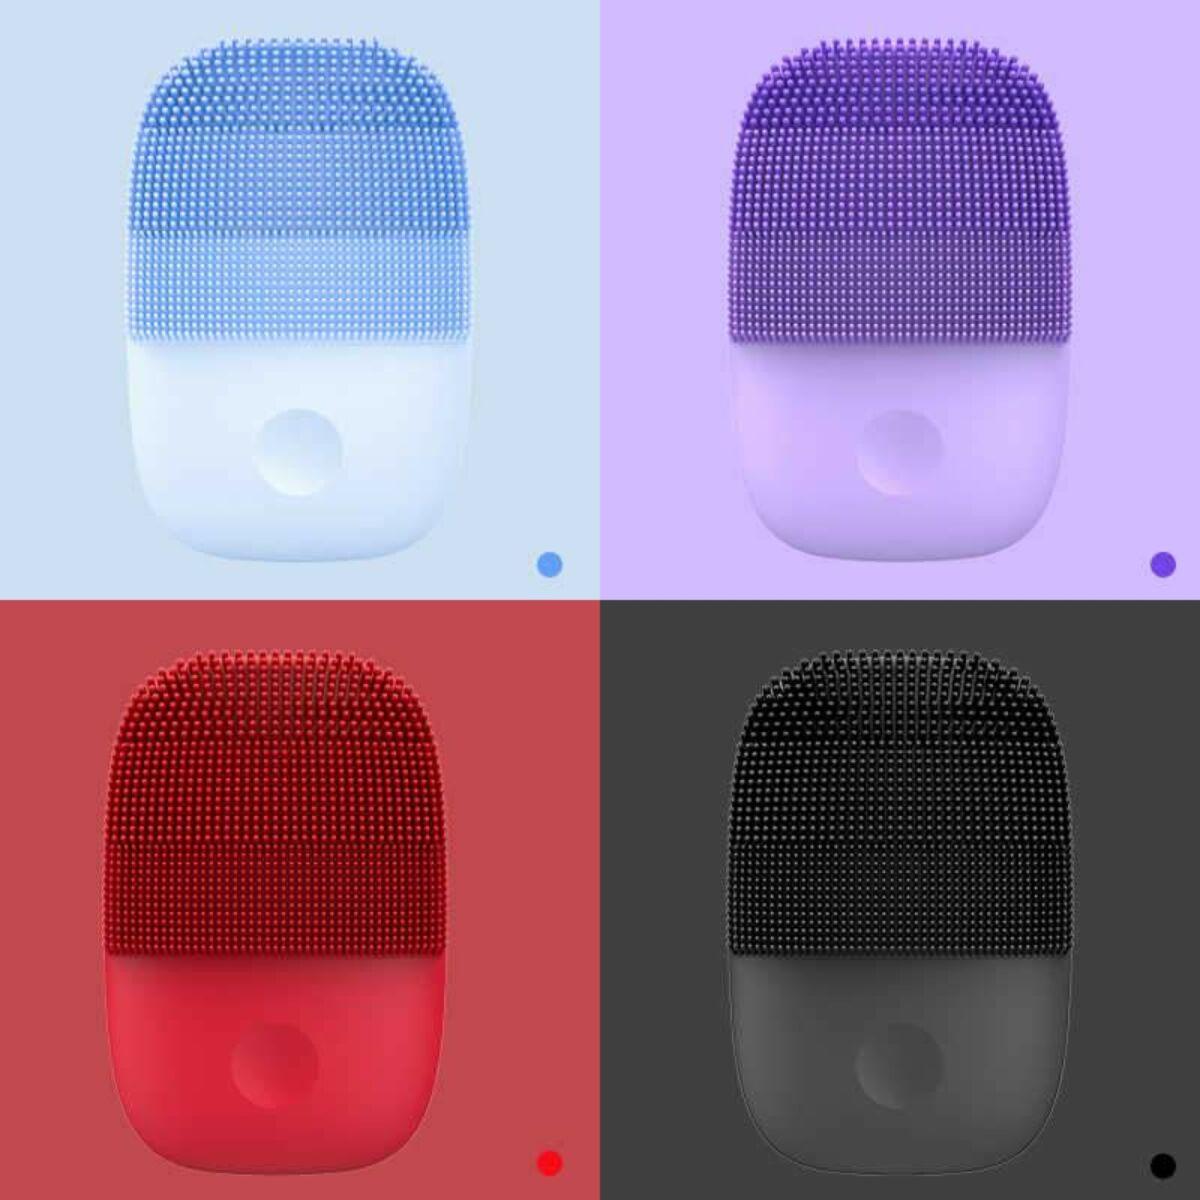 Xiaomi Inface Electric Sonic Facial Cleaner Upgrade Version, Elektronikus arctisztító ecset, fekete EU